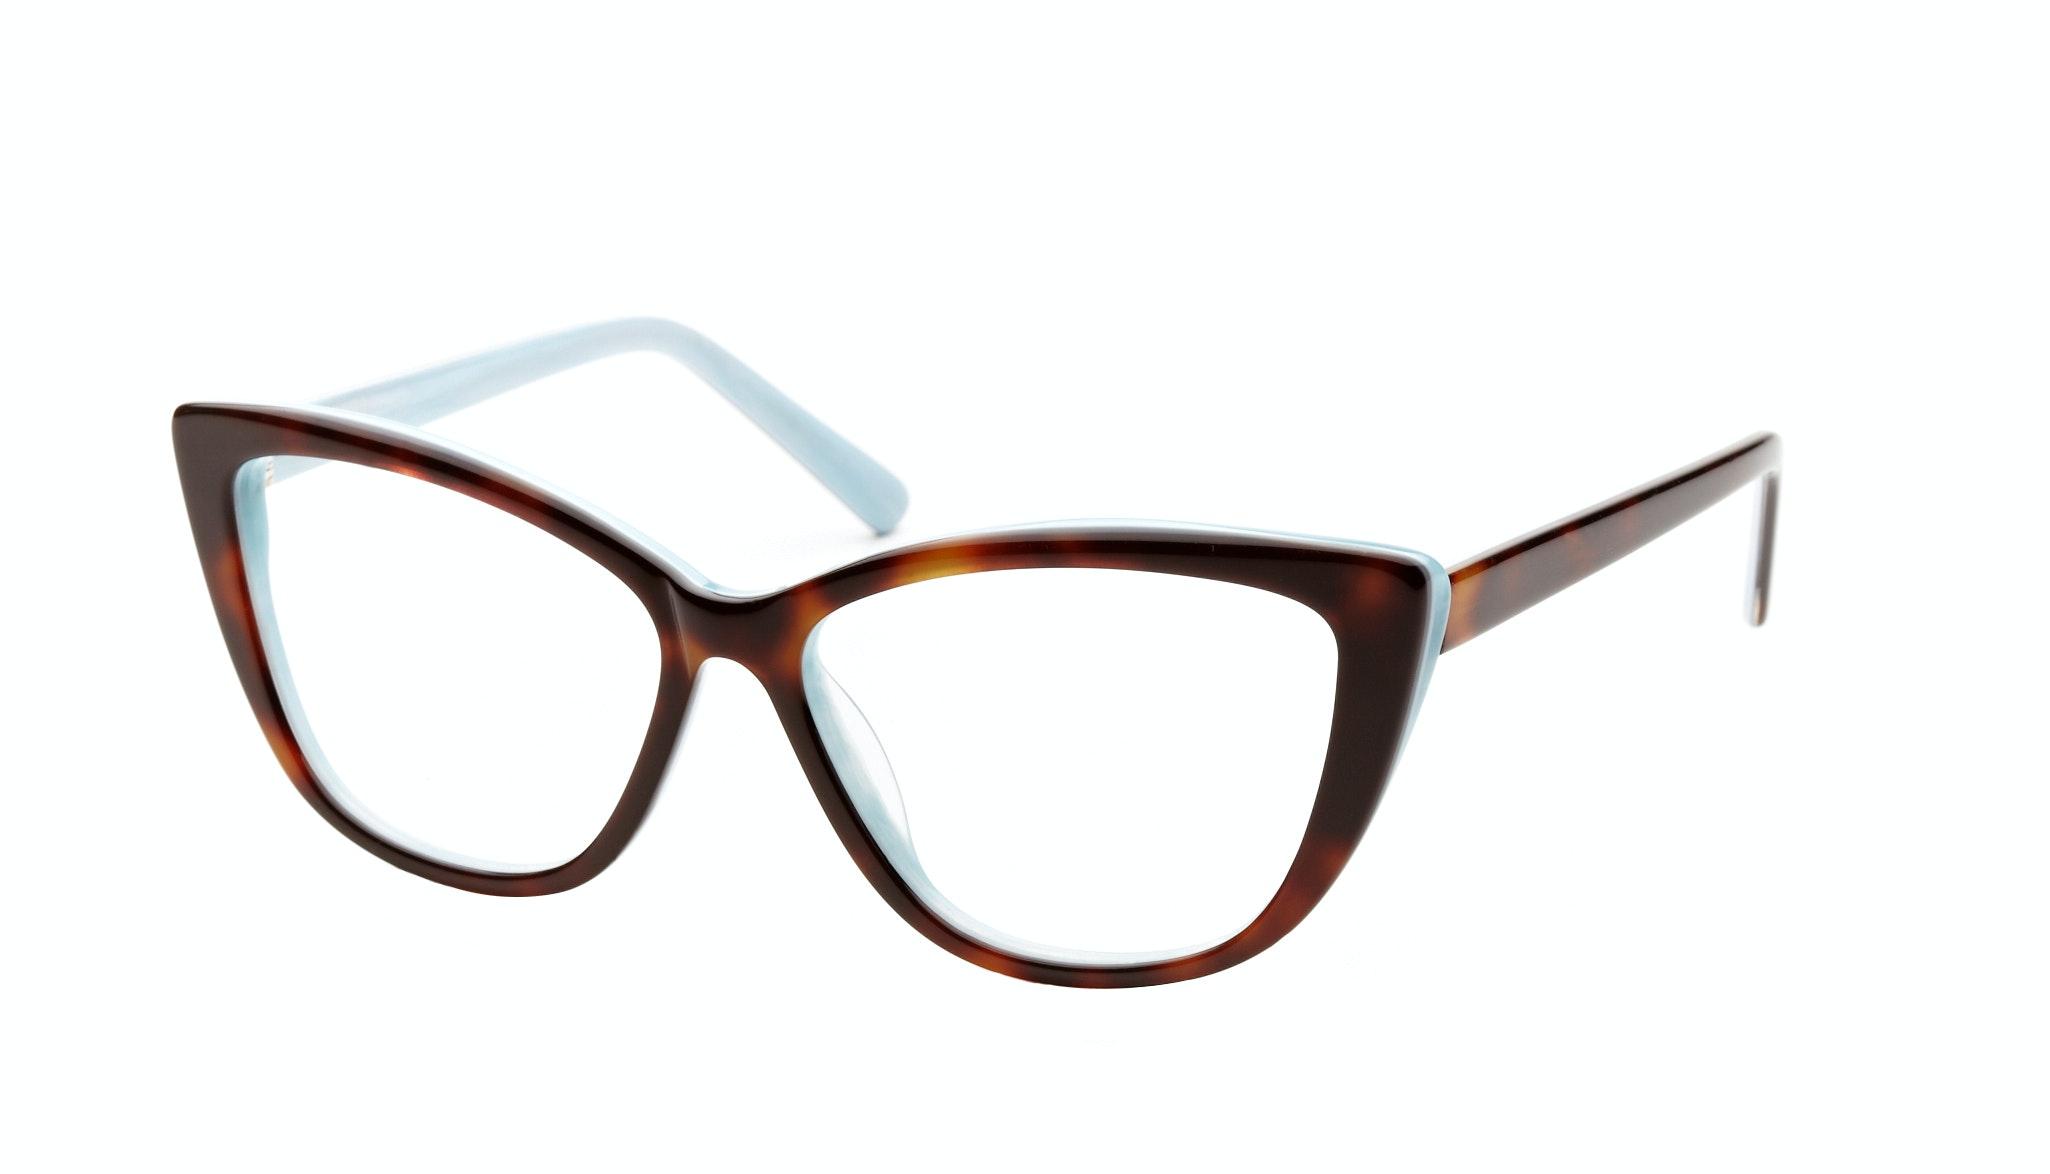 Affordable Fashion Glasses Cat Eye Eyeglasses Women Dolled Up Dreamy Tortoise Tilt